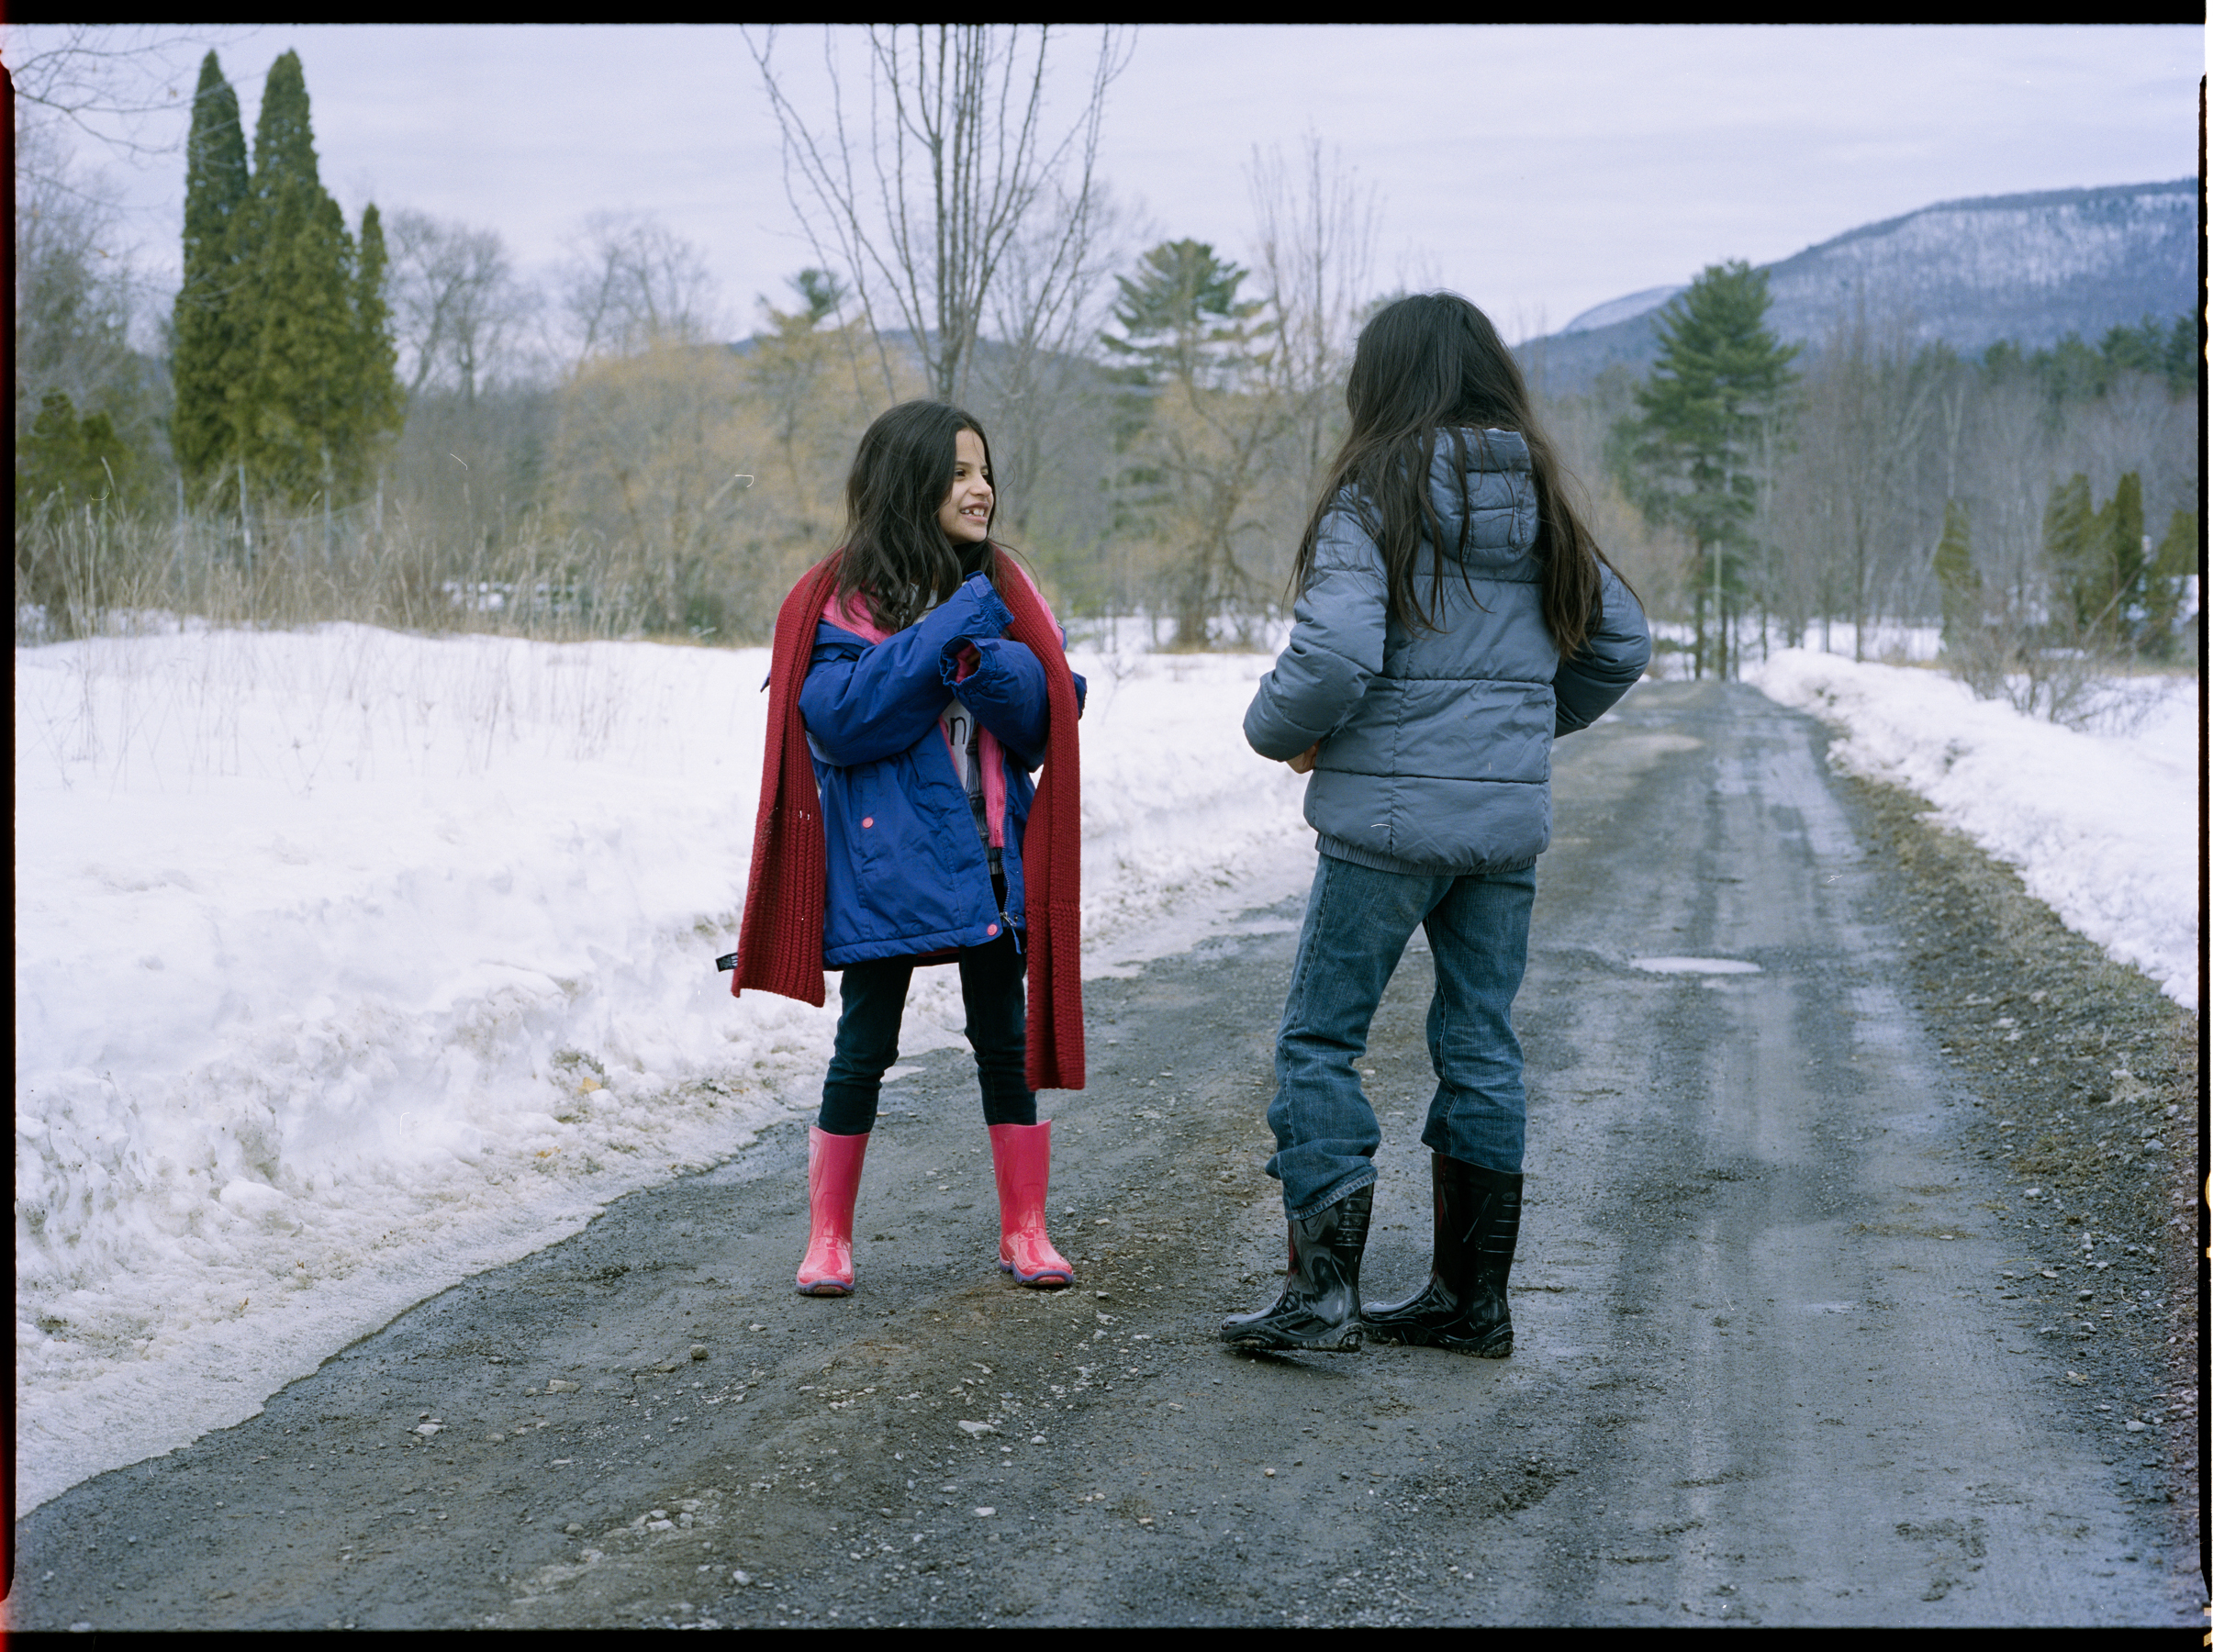 Liliana and Aleena Toro as Cora and Lyle  645 Kodak Portra (Medium Format)